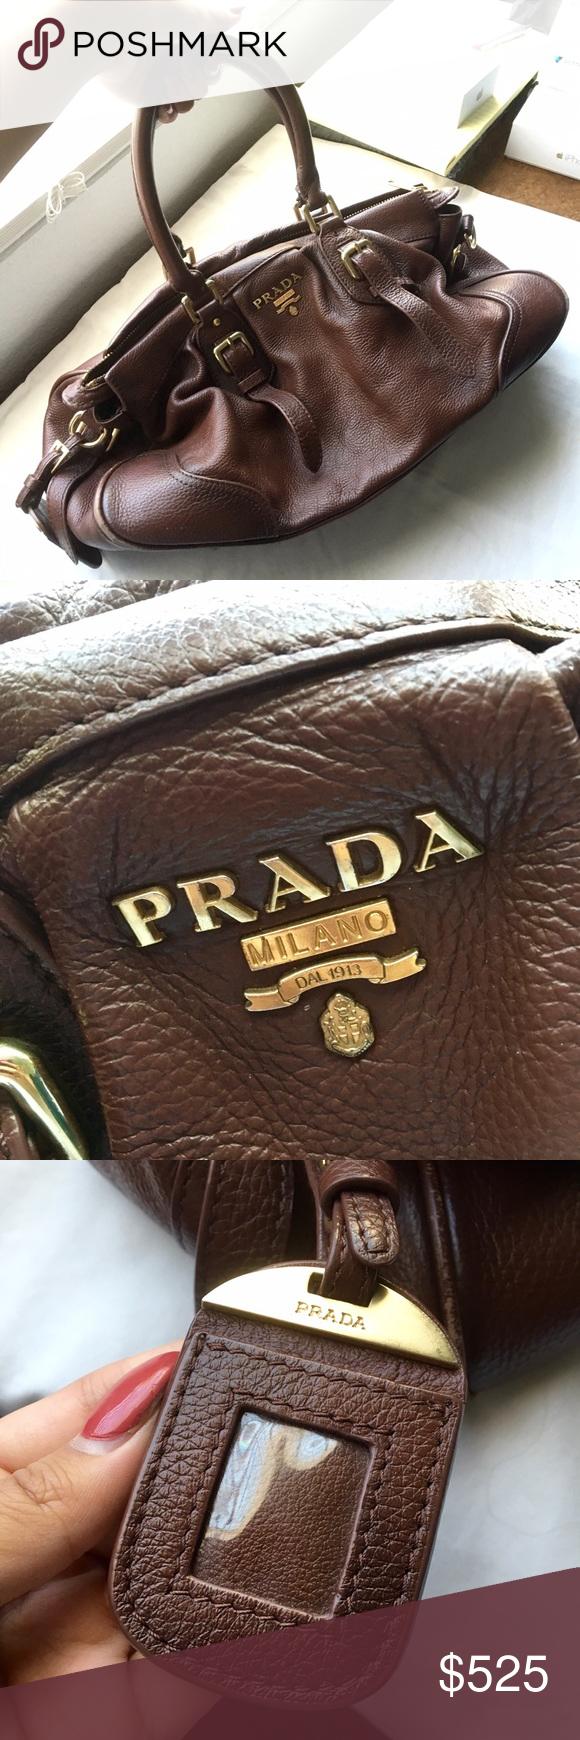 1774f38e75c3 clearance prada milano handbag 100 authentic this is a beautiful grained  calf leather handbag in ae0f3